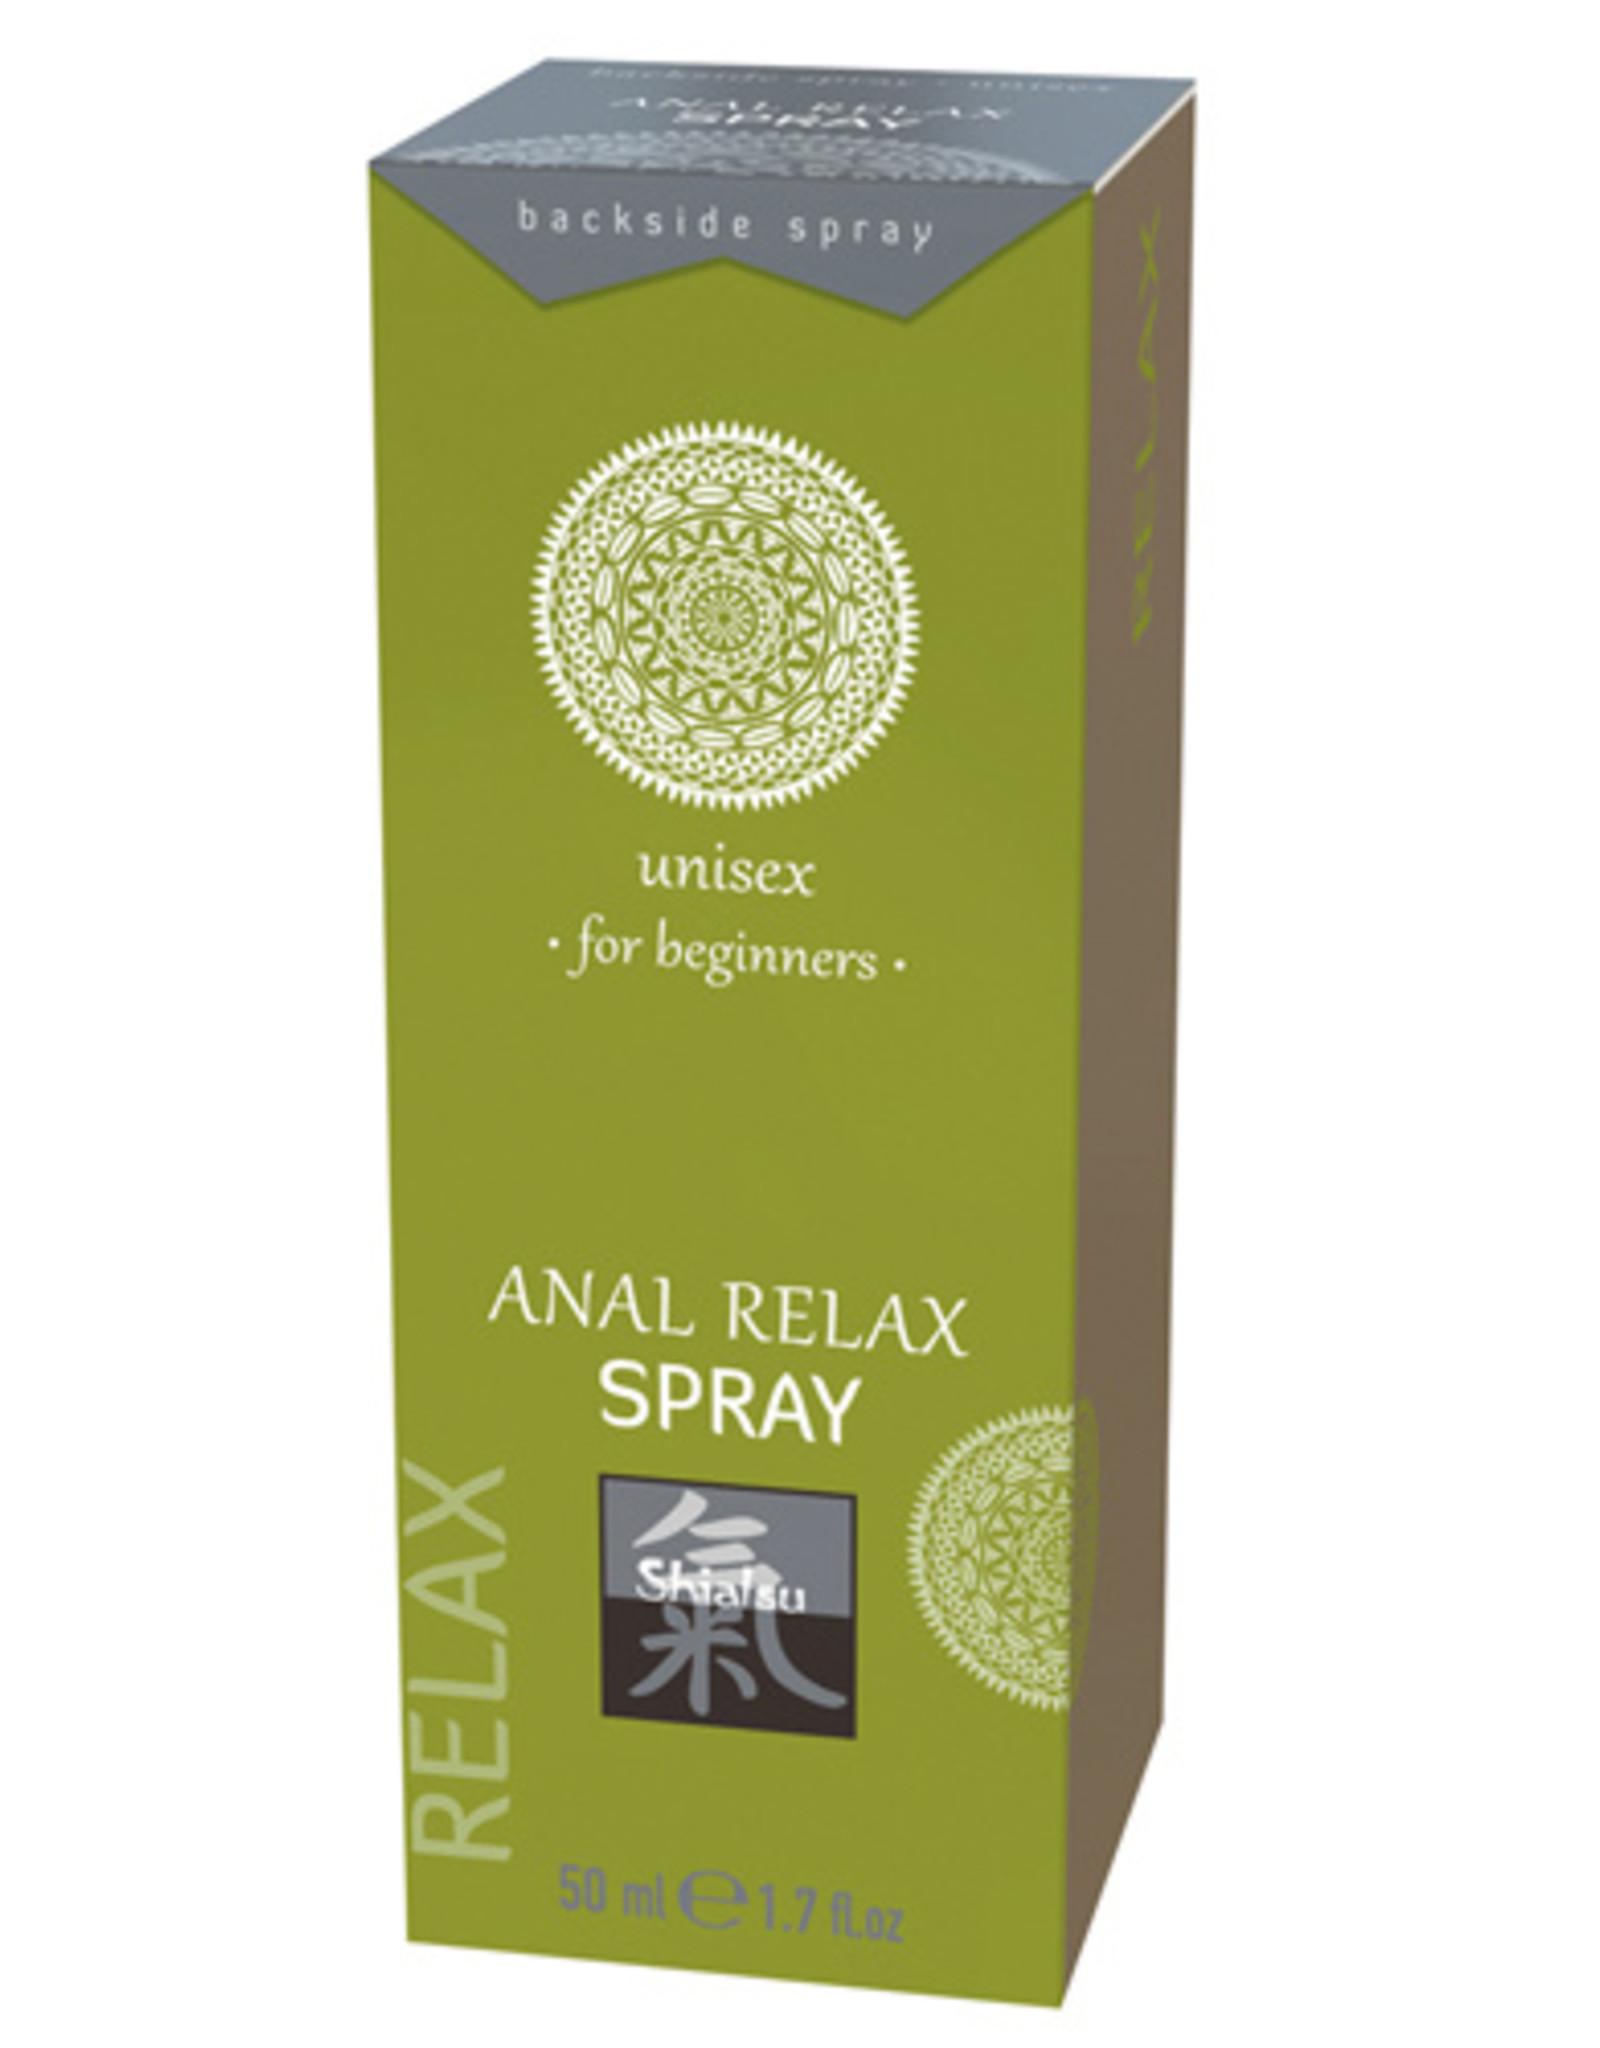 Shiatsu Anal Relax Spray - Voor Beginners